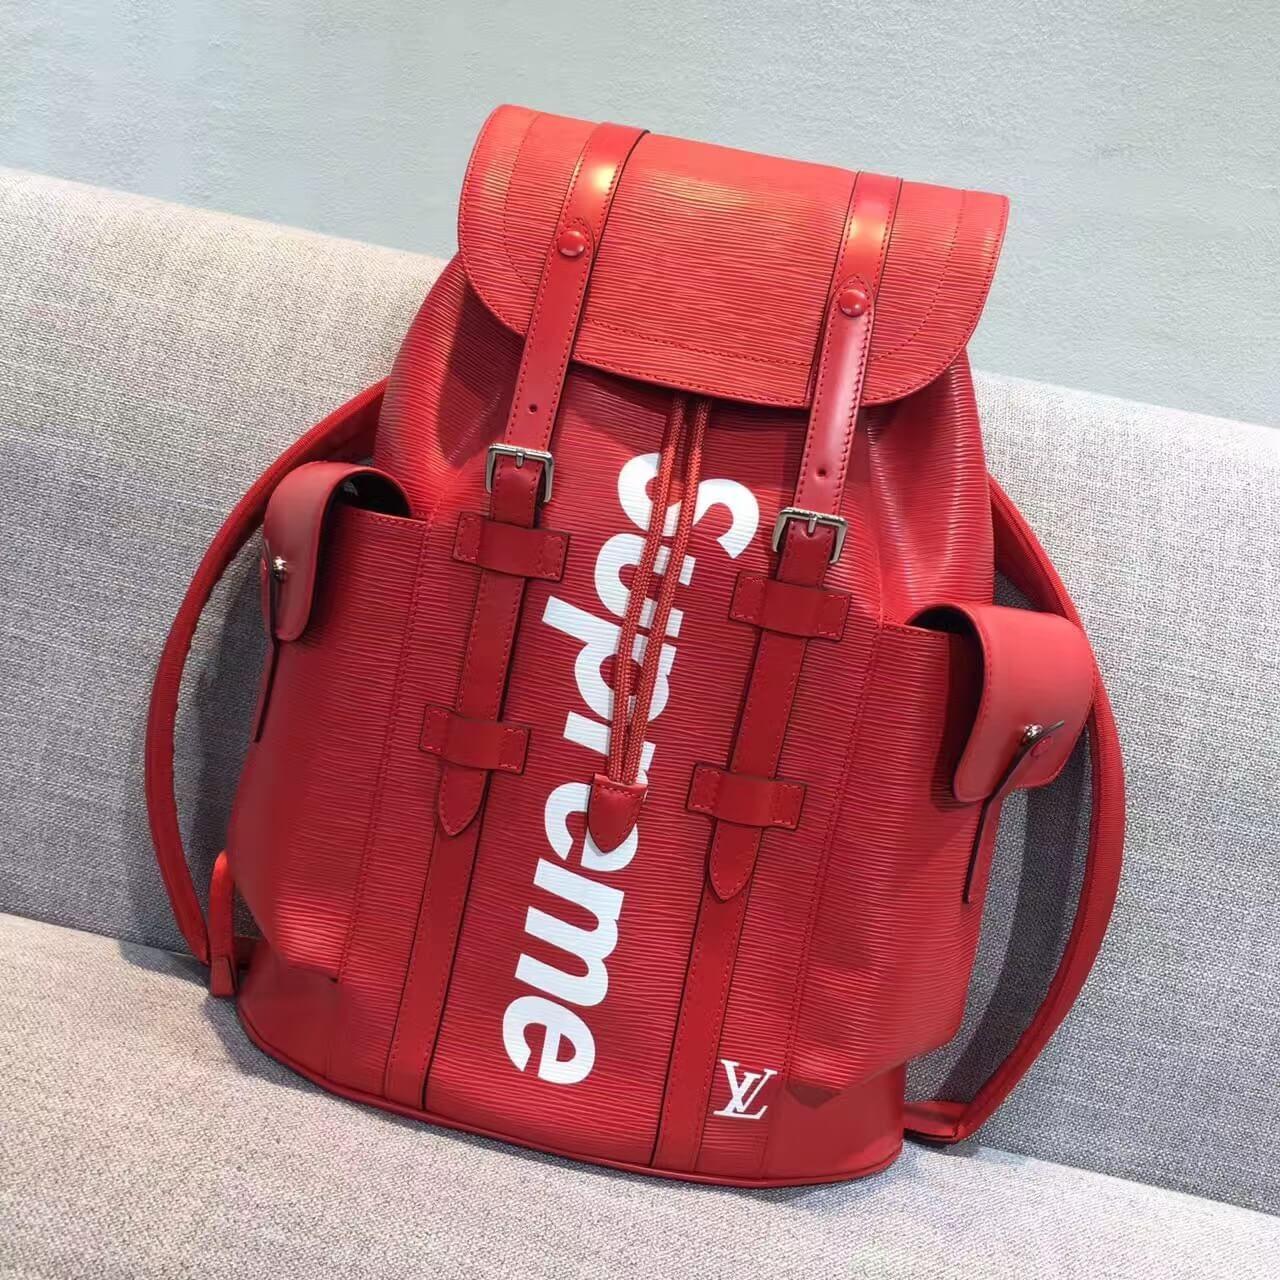 Louis Vuitton x Supreme Epi Leather Christopher PM Backpack Red 2017 ... c49d6945af587